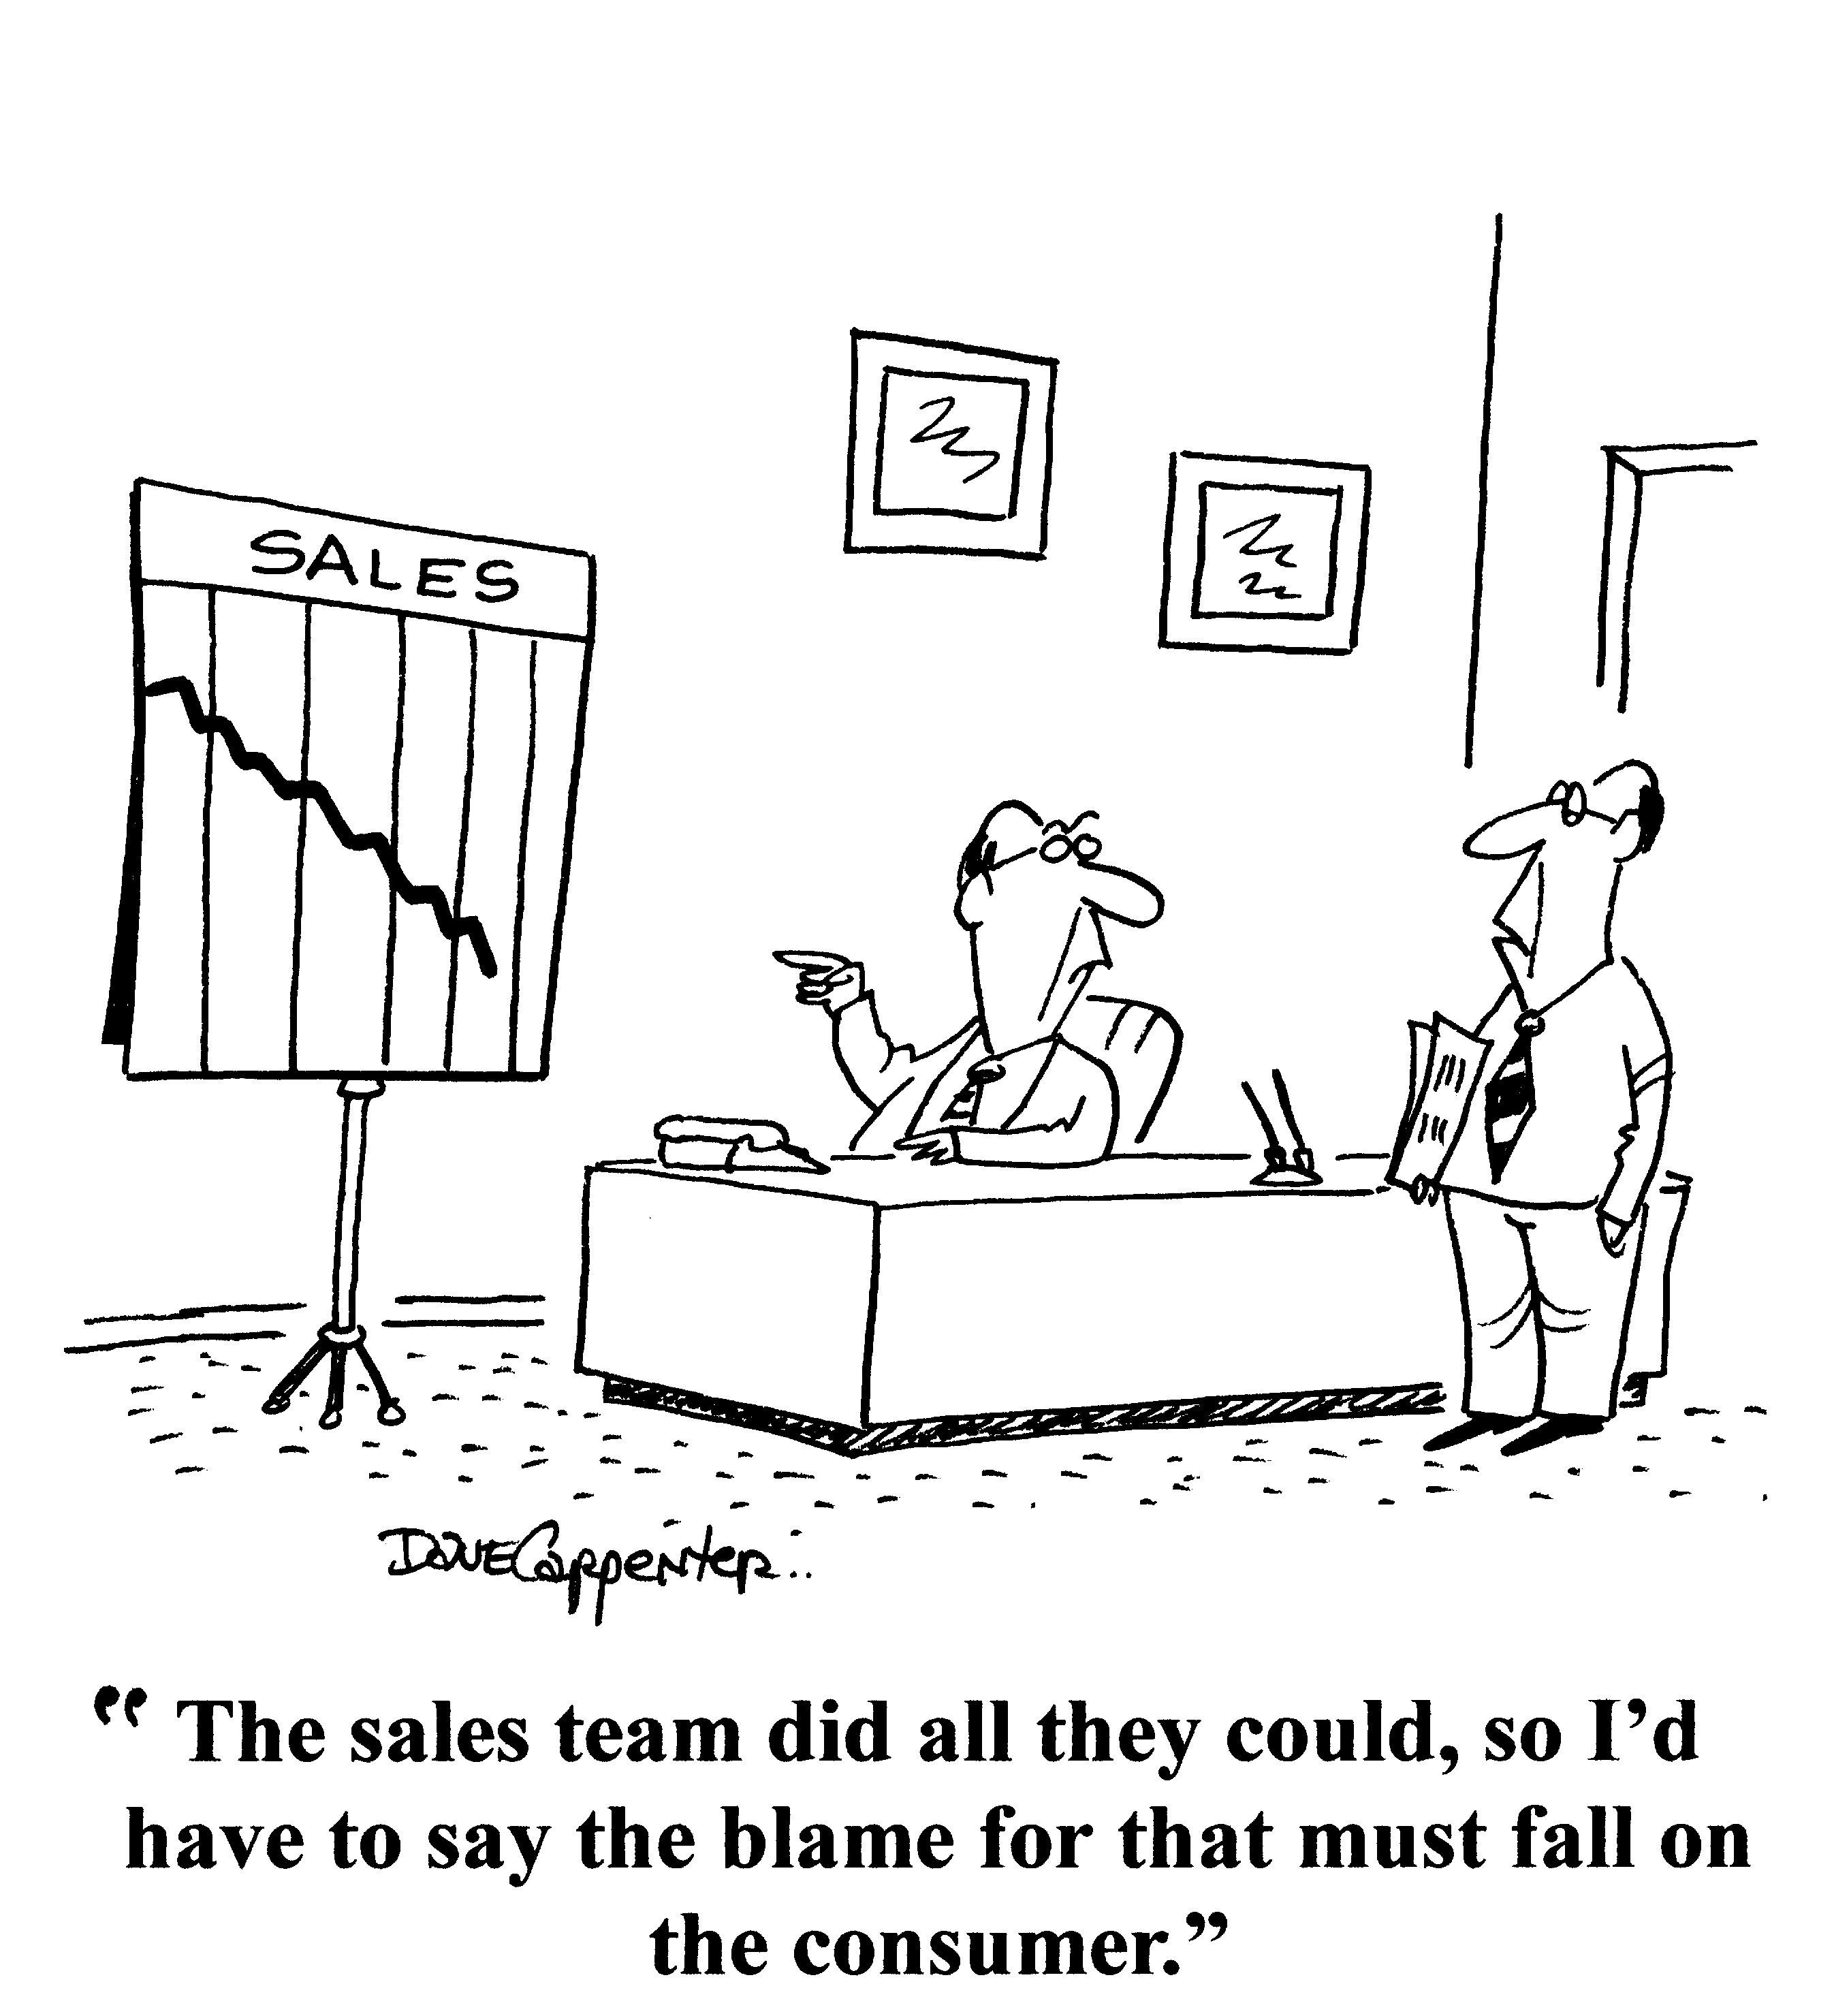 calyps.ch sales-cartoon-customer-fault (1).jpg